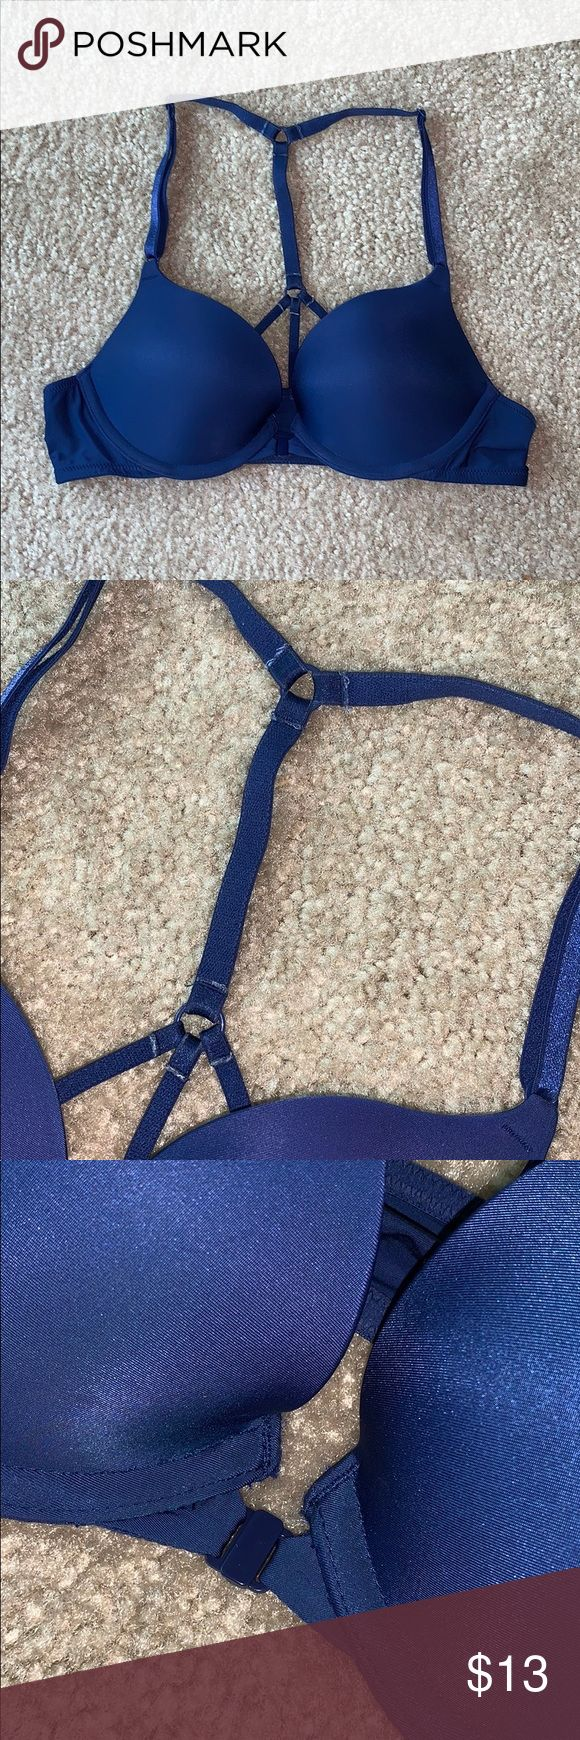 Victoria Secret Bra. Really cute bright blue push up bra with fun back straps. I…